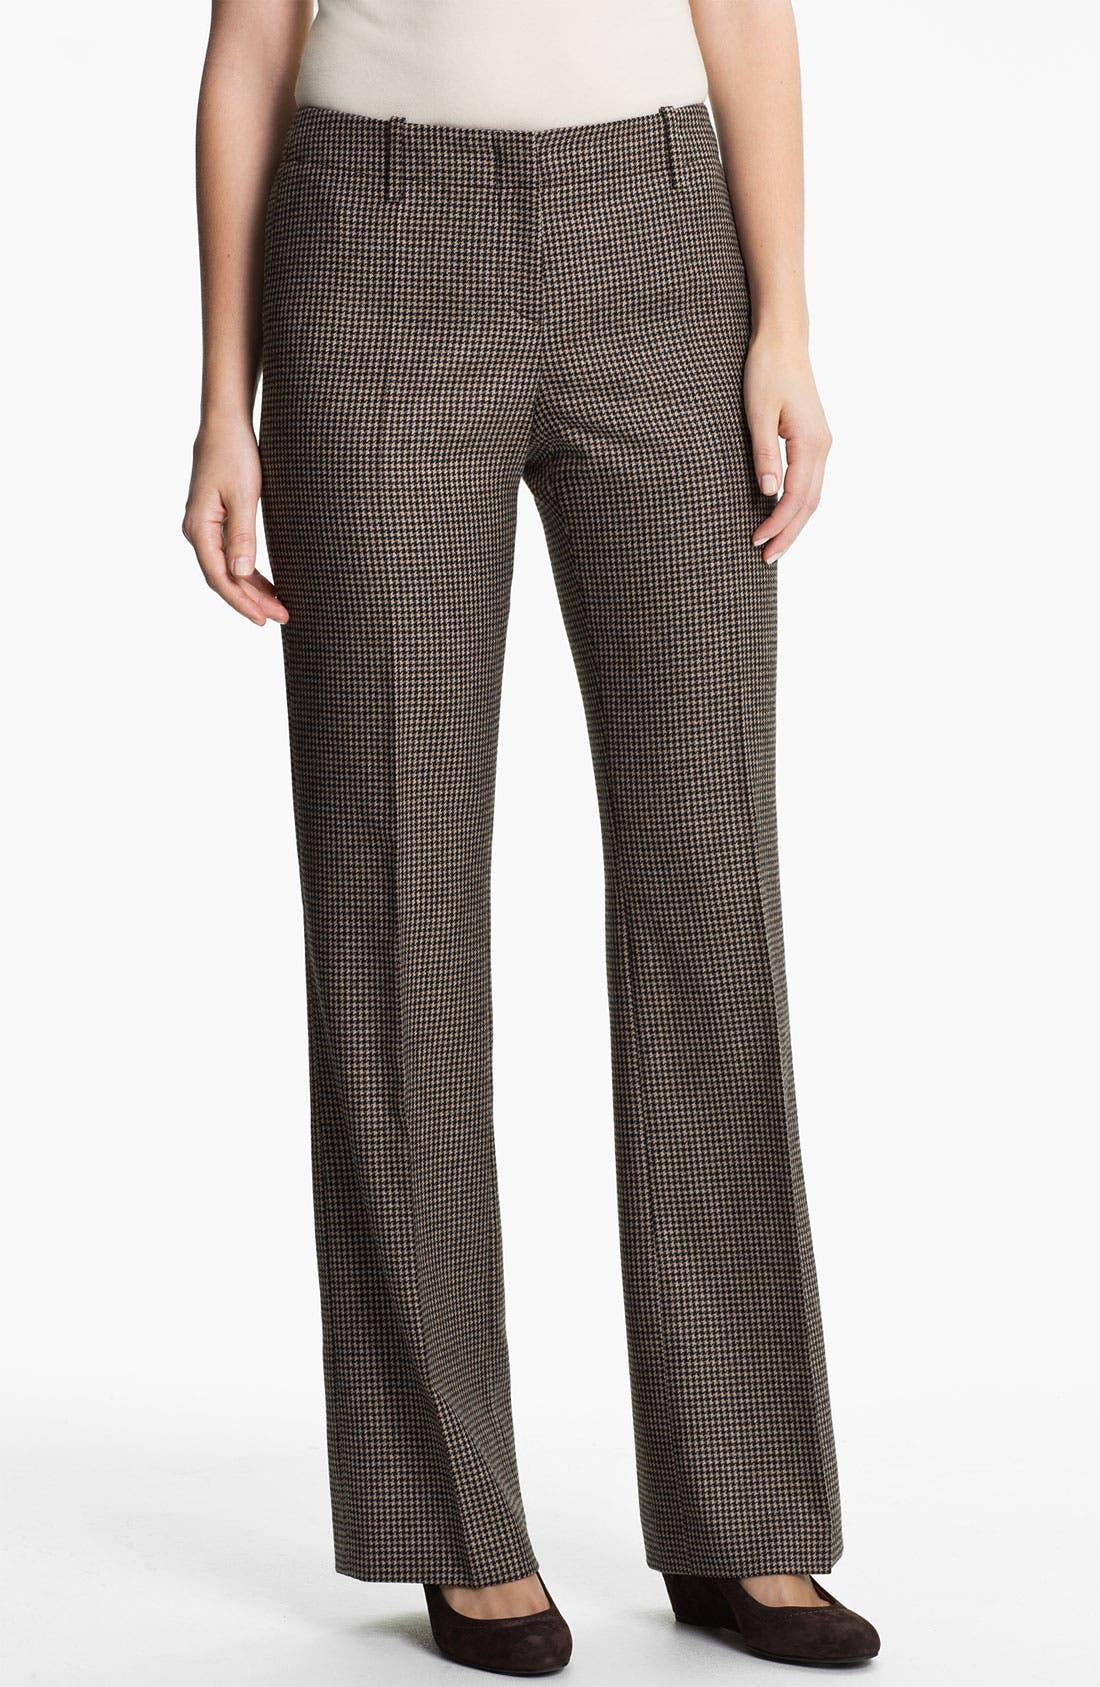 Alternate Image 1 Selected - BOSS HUGO BOSS 'Tulia4' Check Pattern Trousers